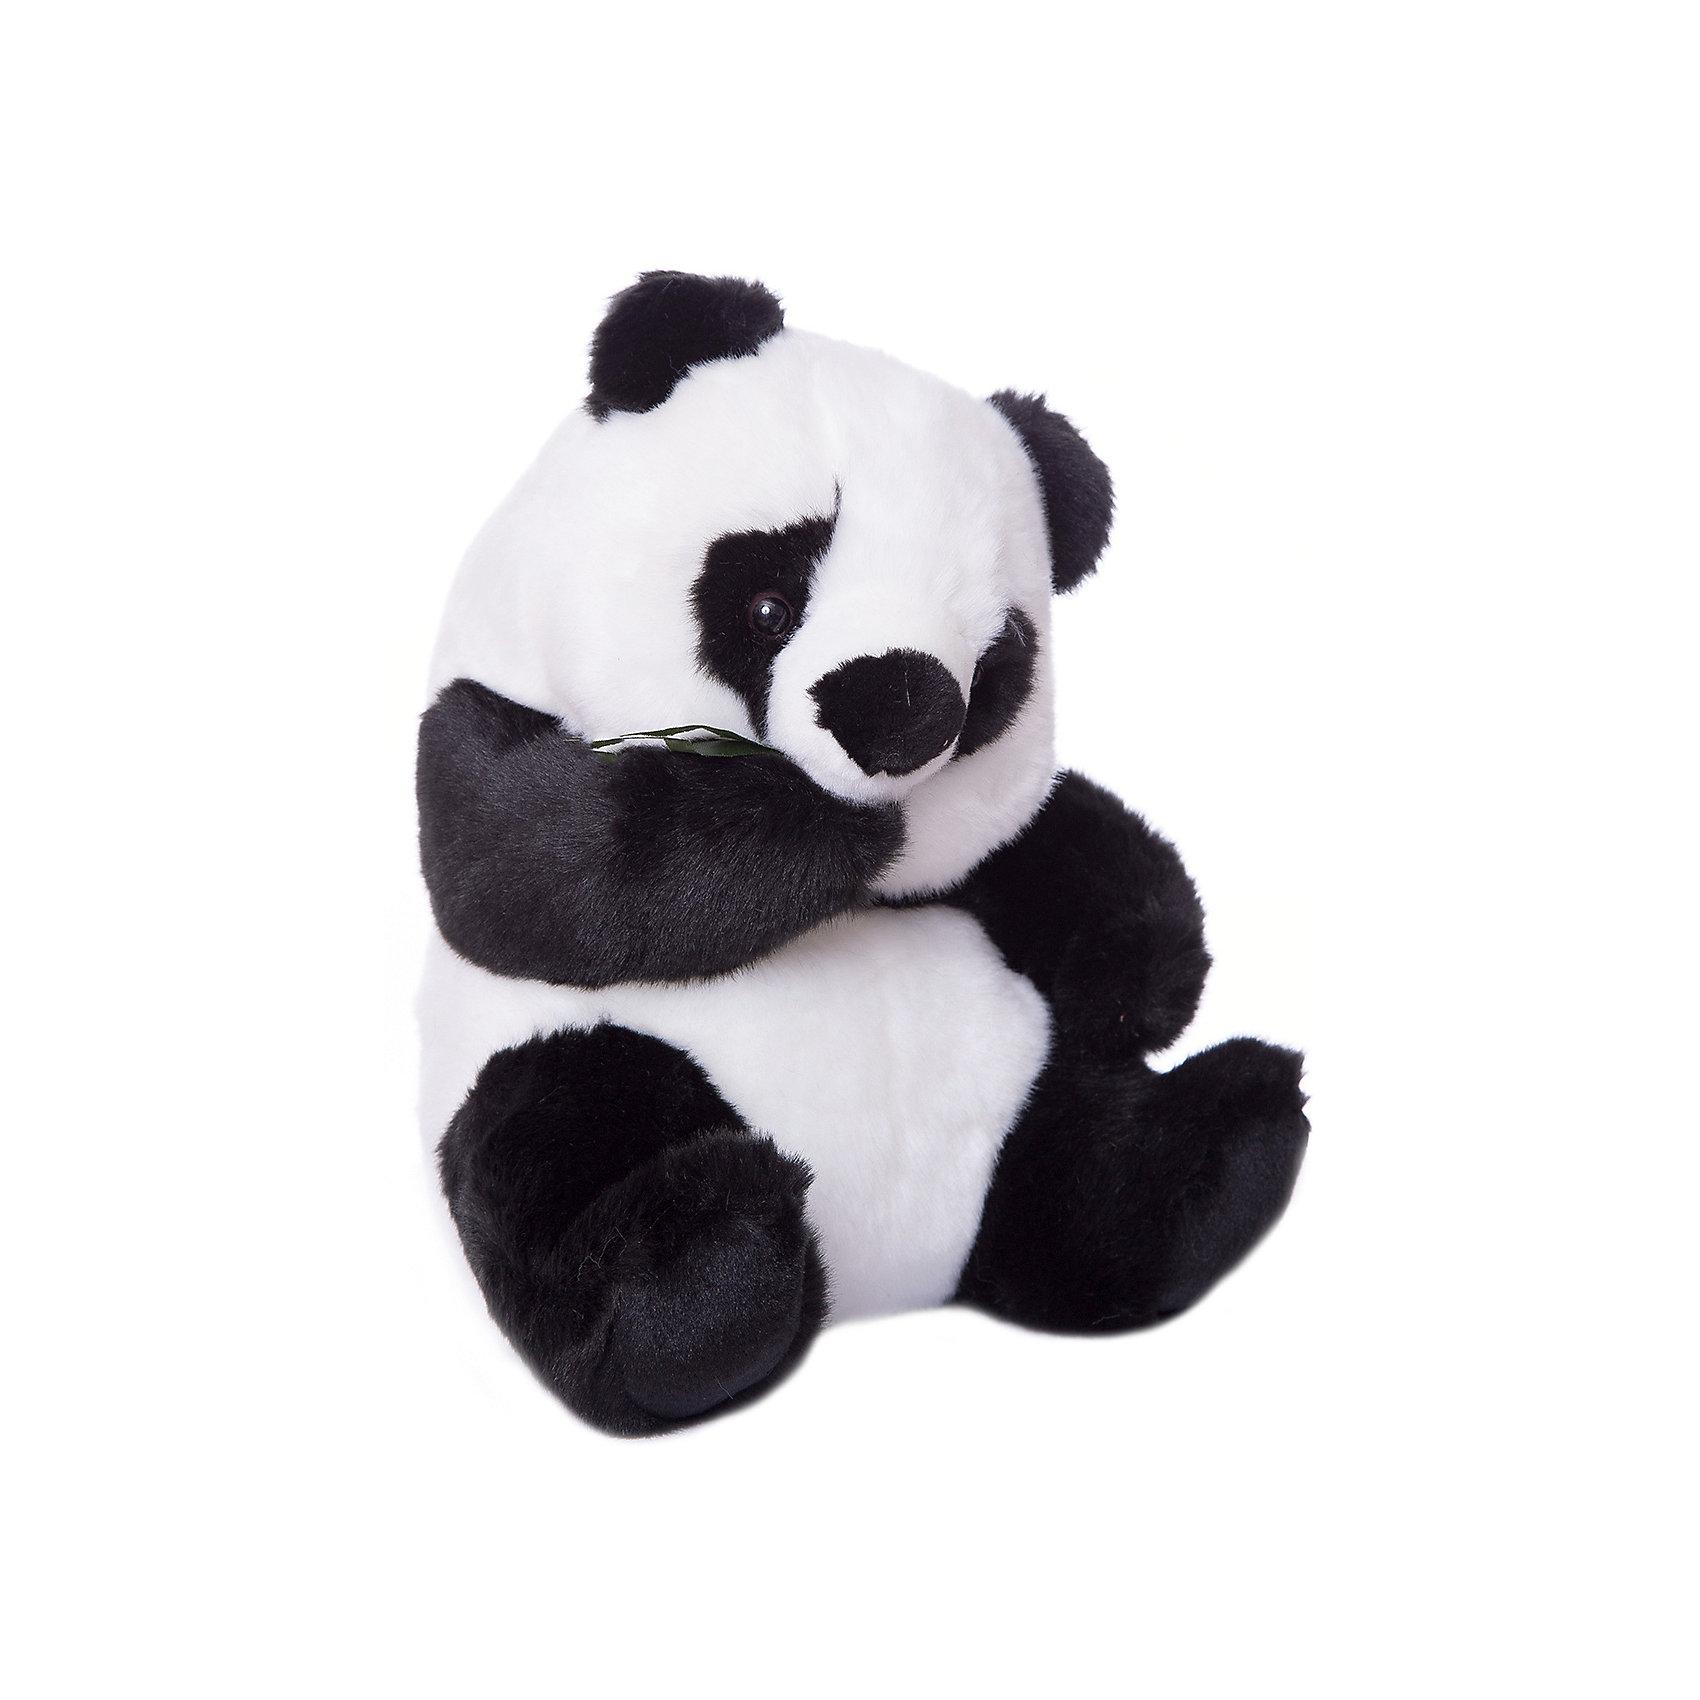 Hansa Hansa Панда, 25см hansa мягкая игрушка панда hansa 25см